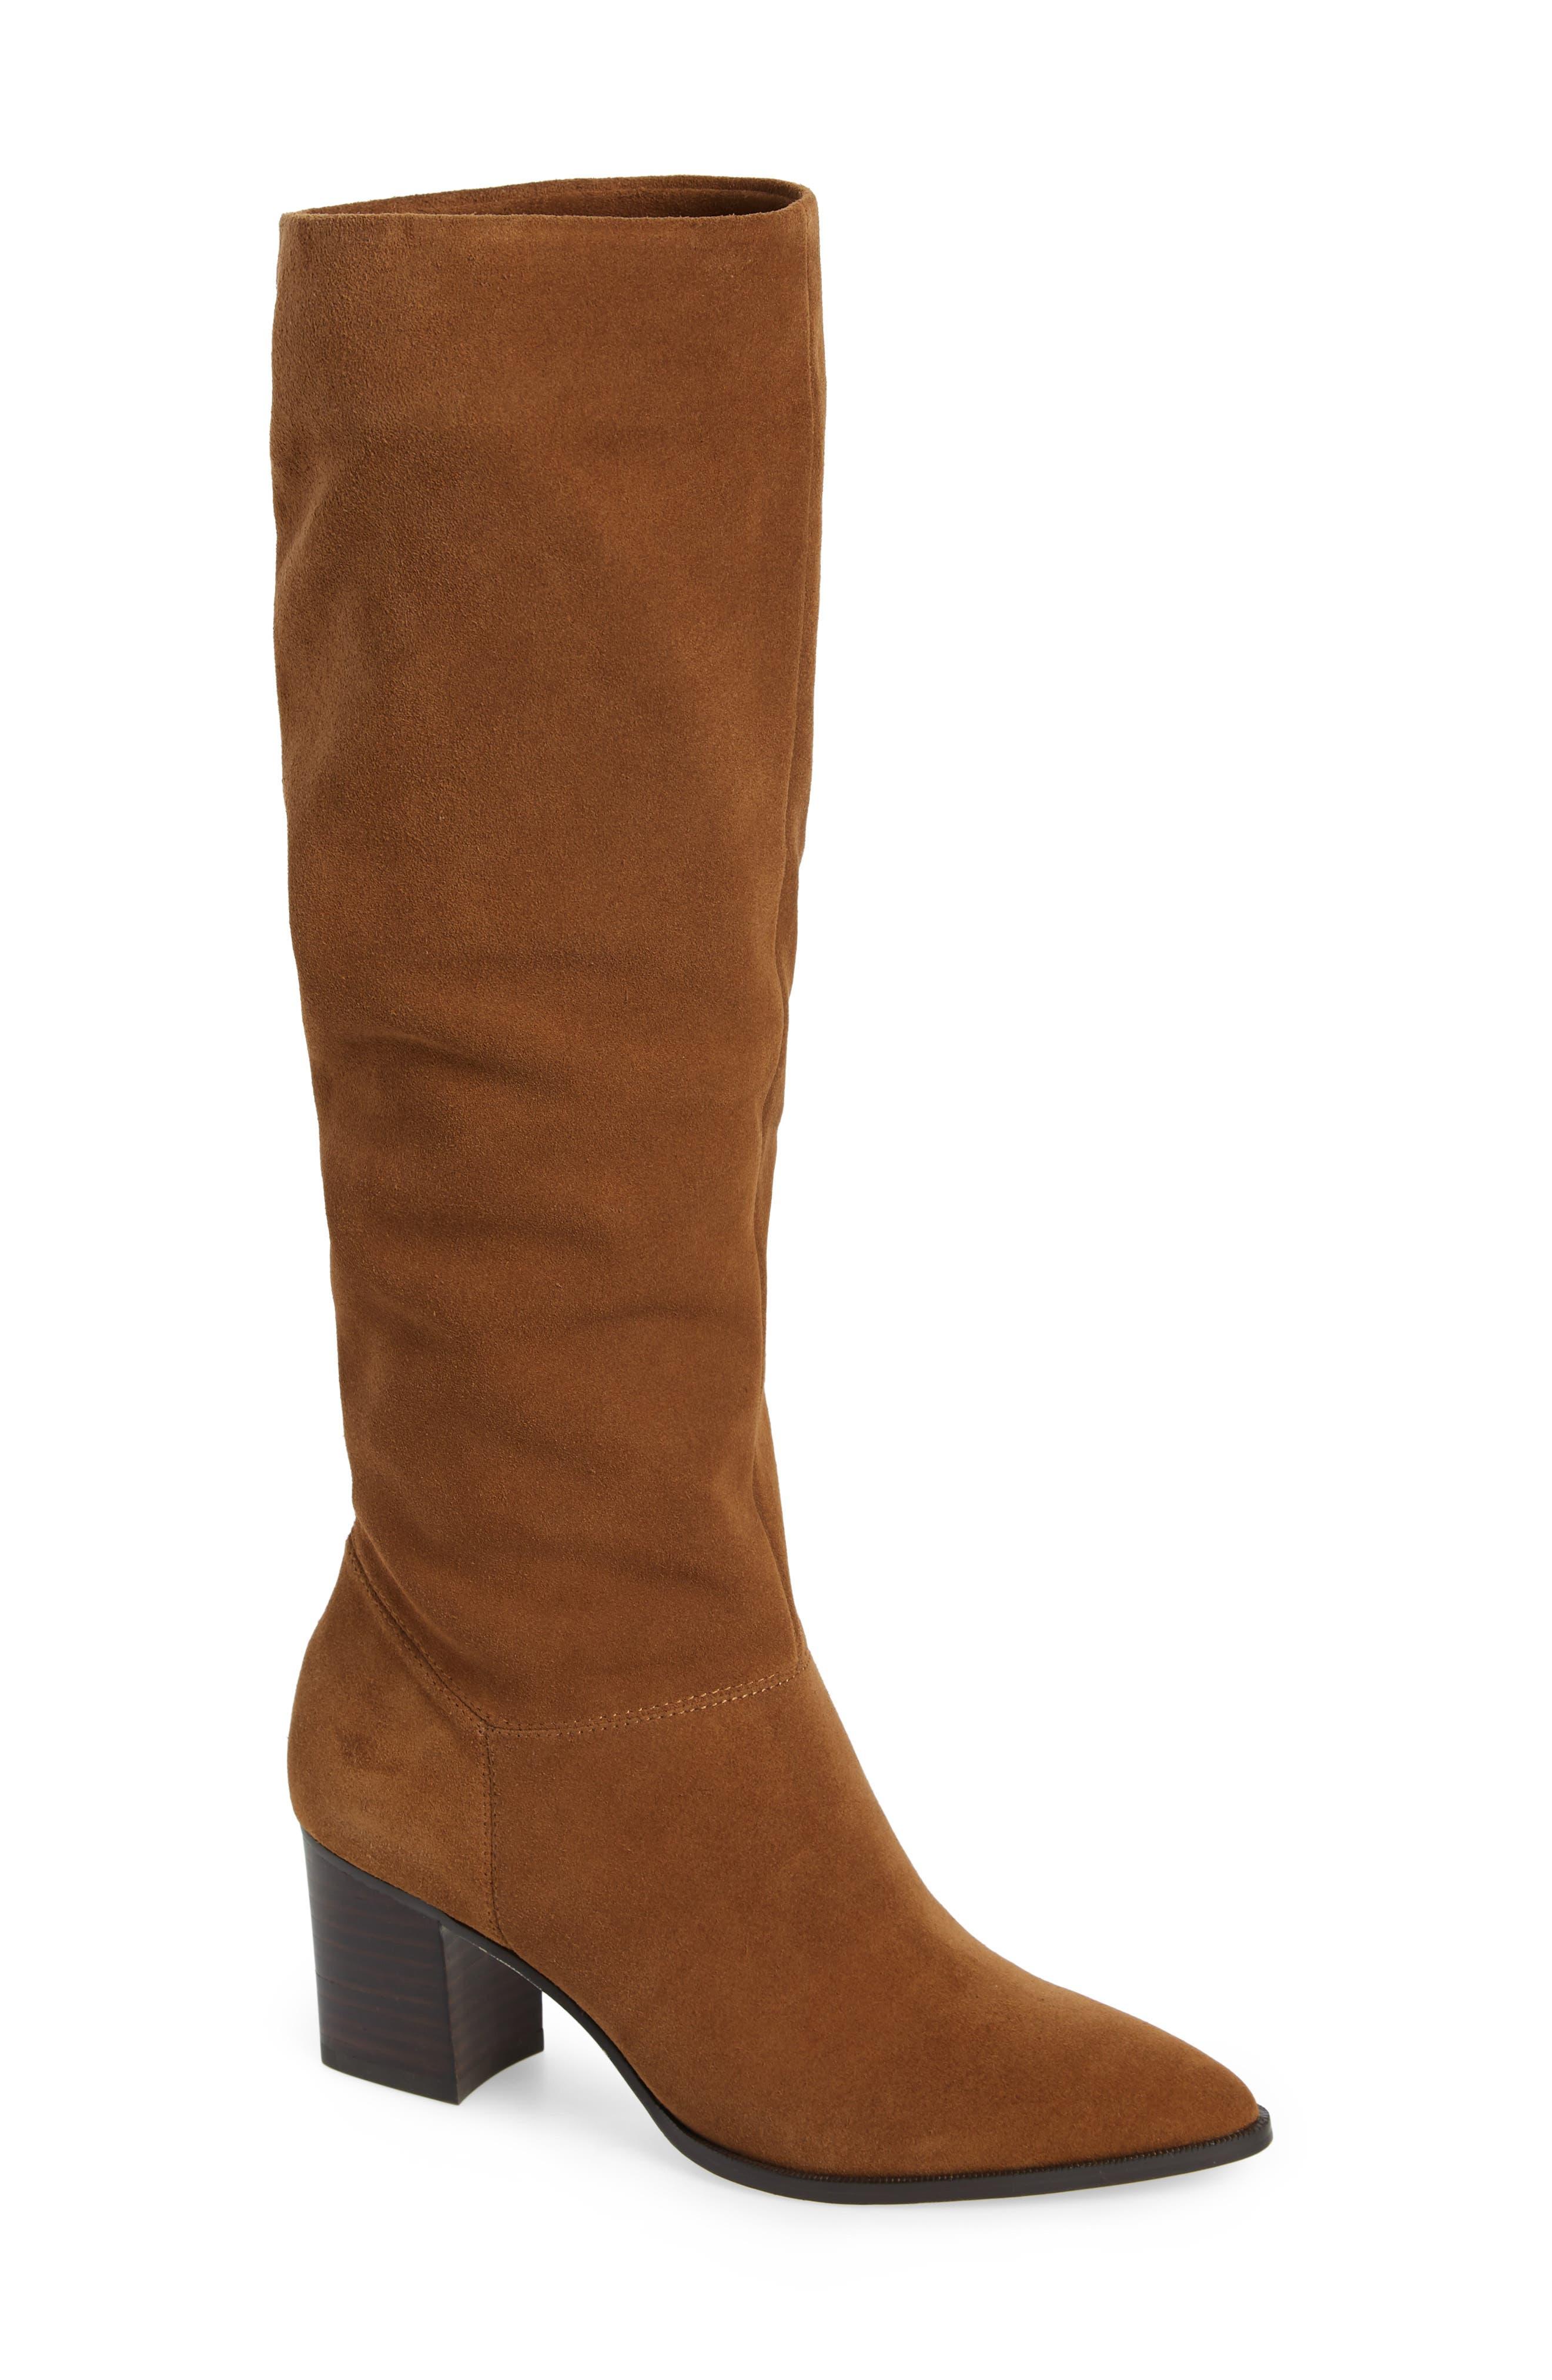 Sole Society Danilynn Knee High Boot- Brown